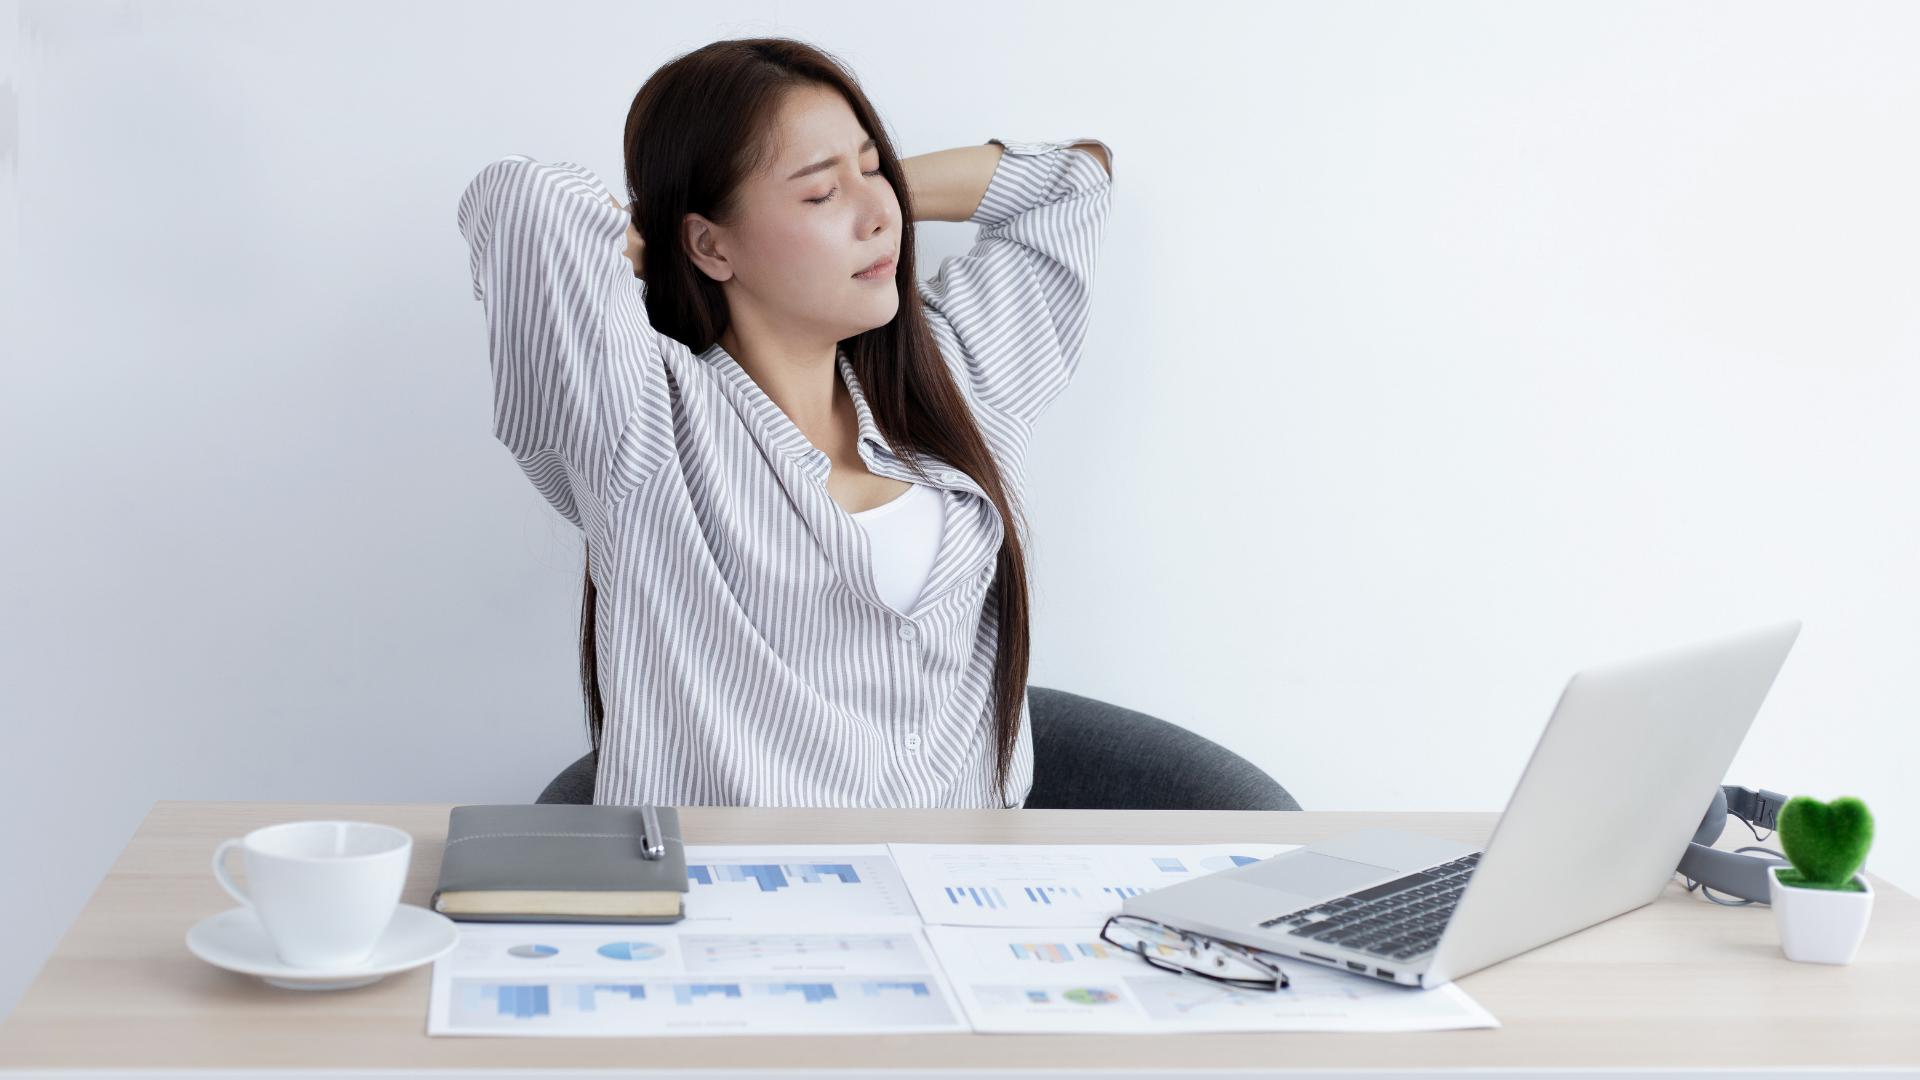 Desk work and ergonomics